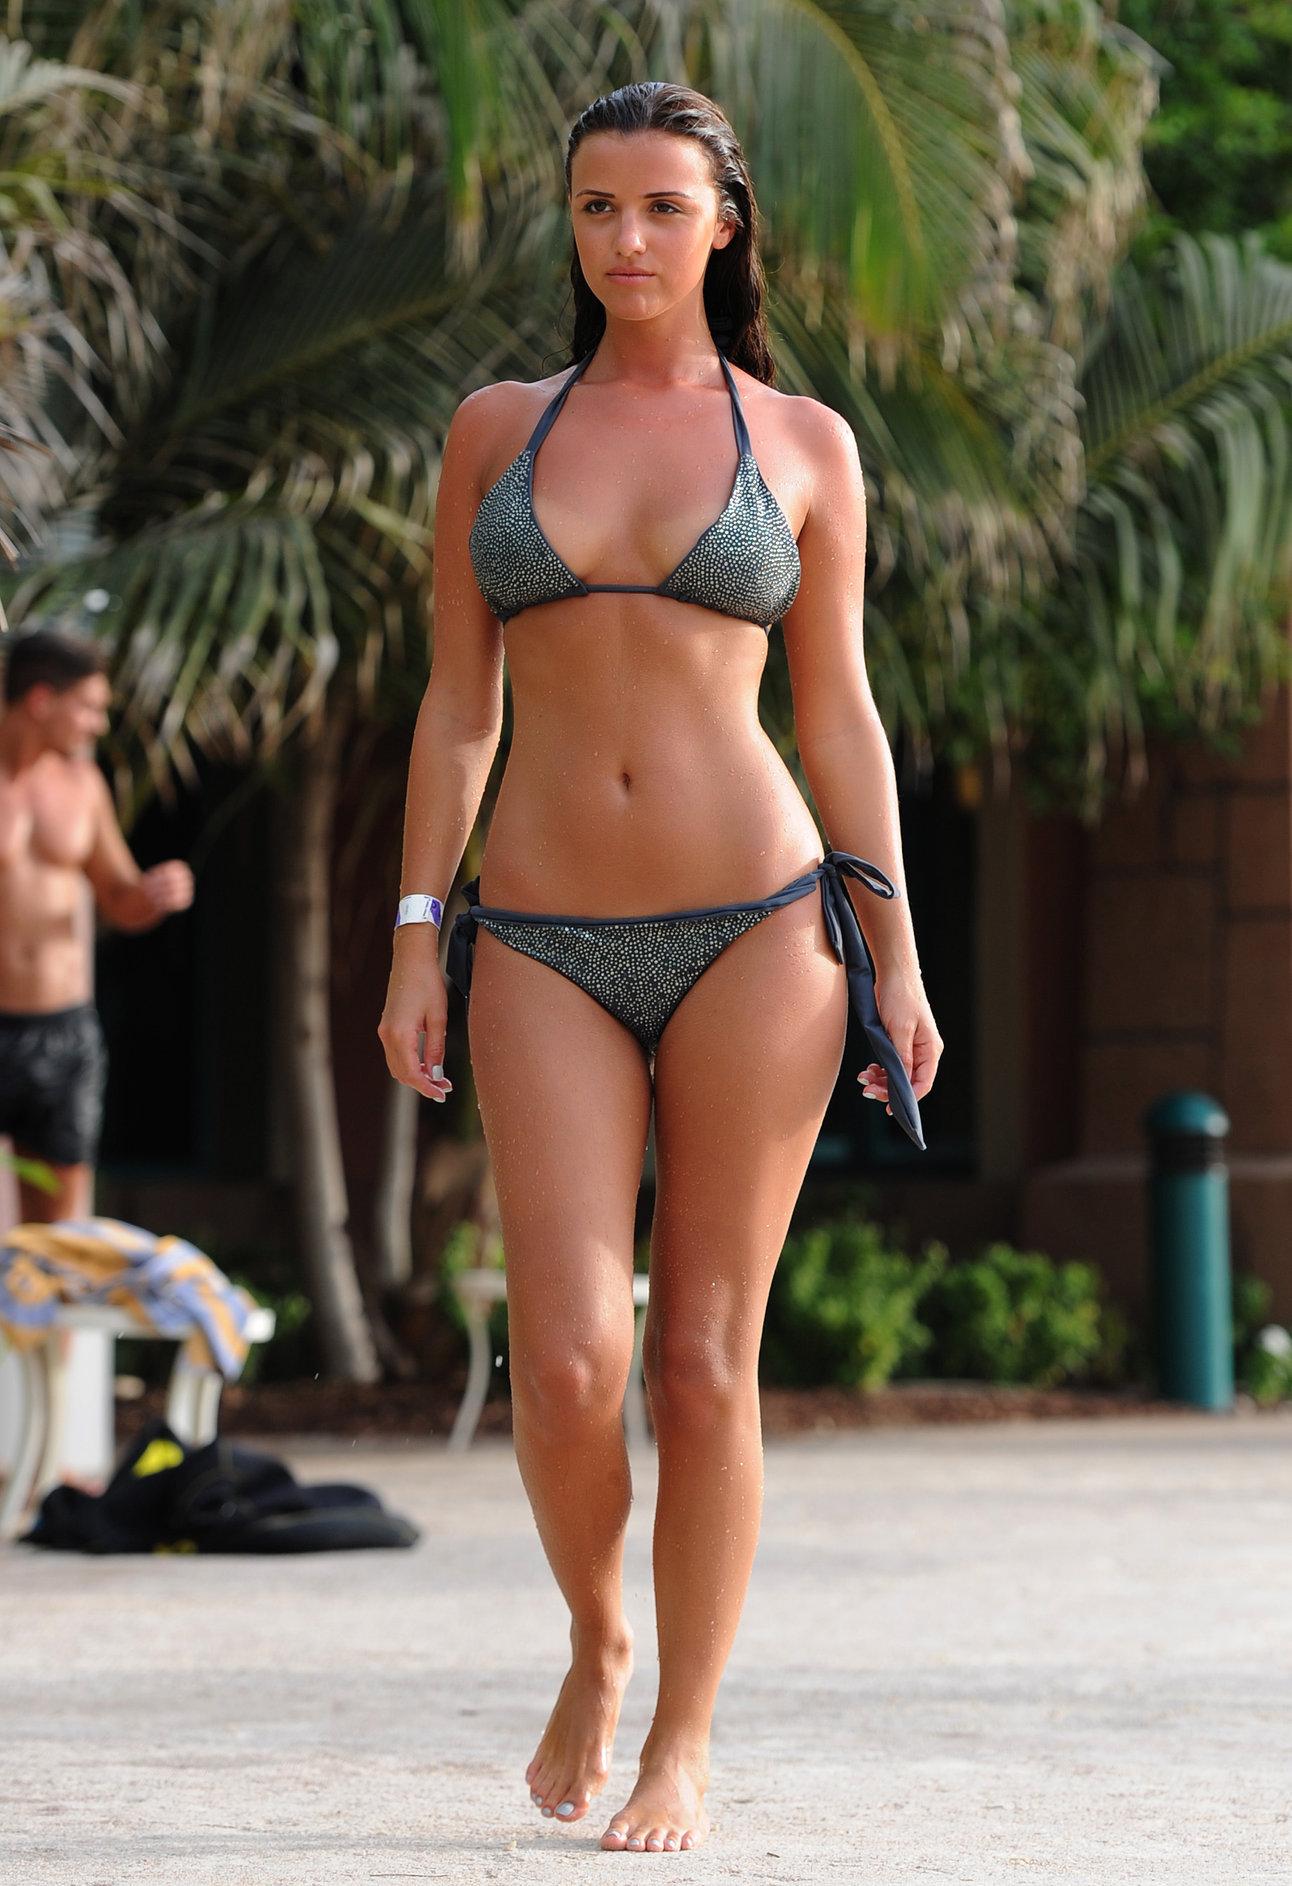 Lucy Mecklenburgh - Bikini Candids In Dubai June 18, 2012